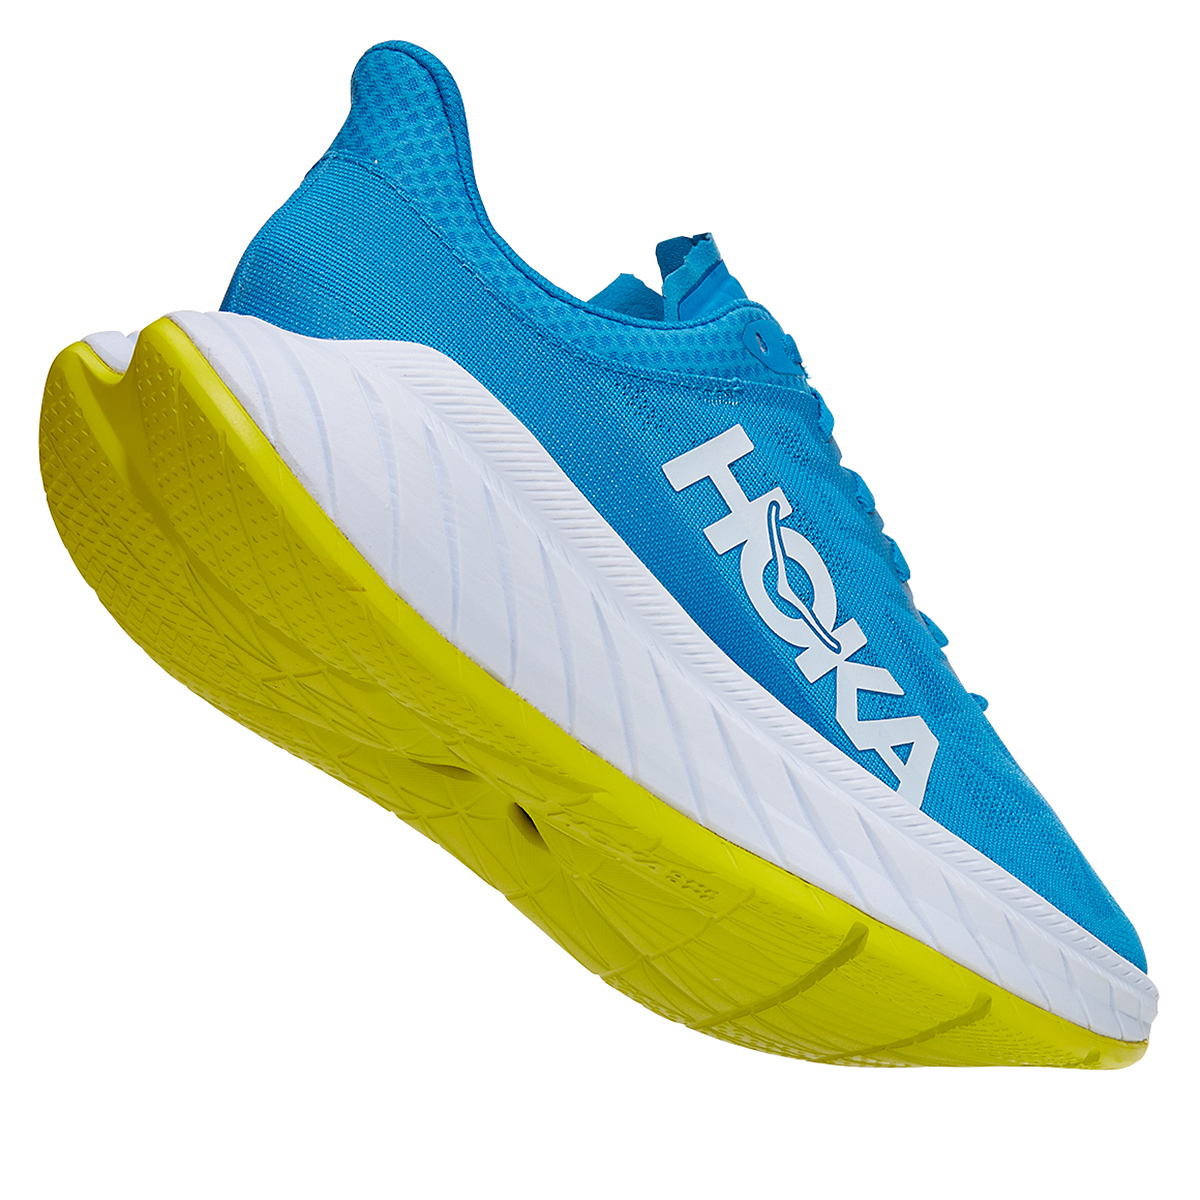 Men's Hoka One One Carbon X 2 Running Shoe - Color: Diva Blue/Citron - Size: 7 - Width: Regular, Diva Blue/Citron, large, image 4